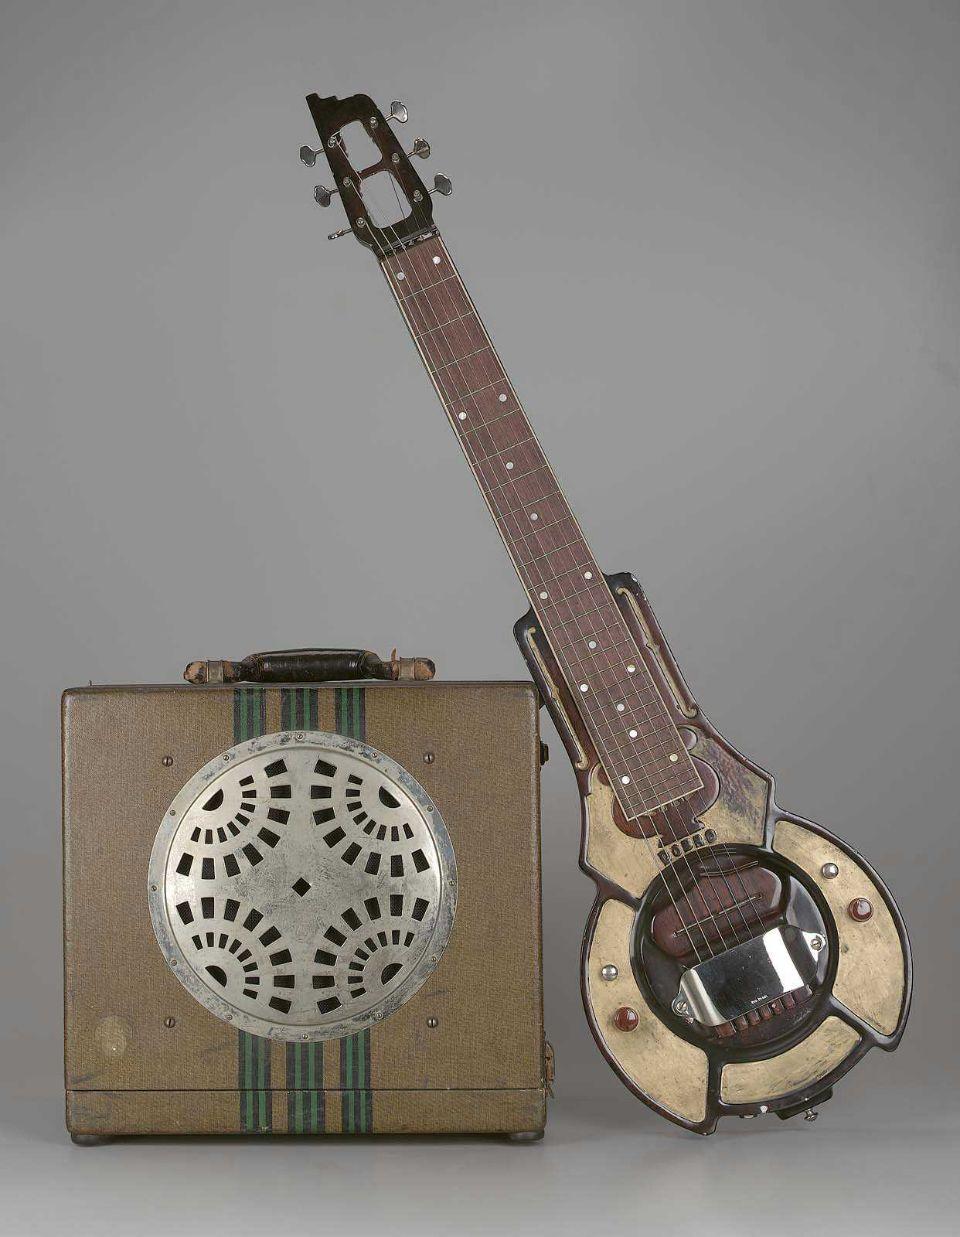 steel guitar and ampliflier, 1936